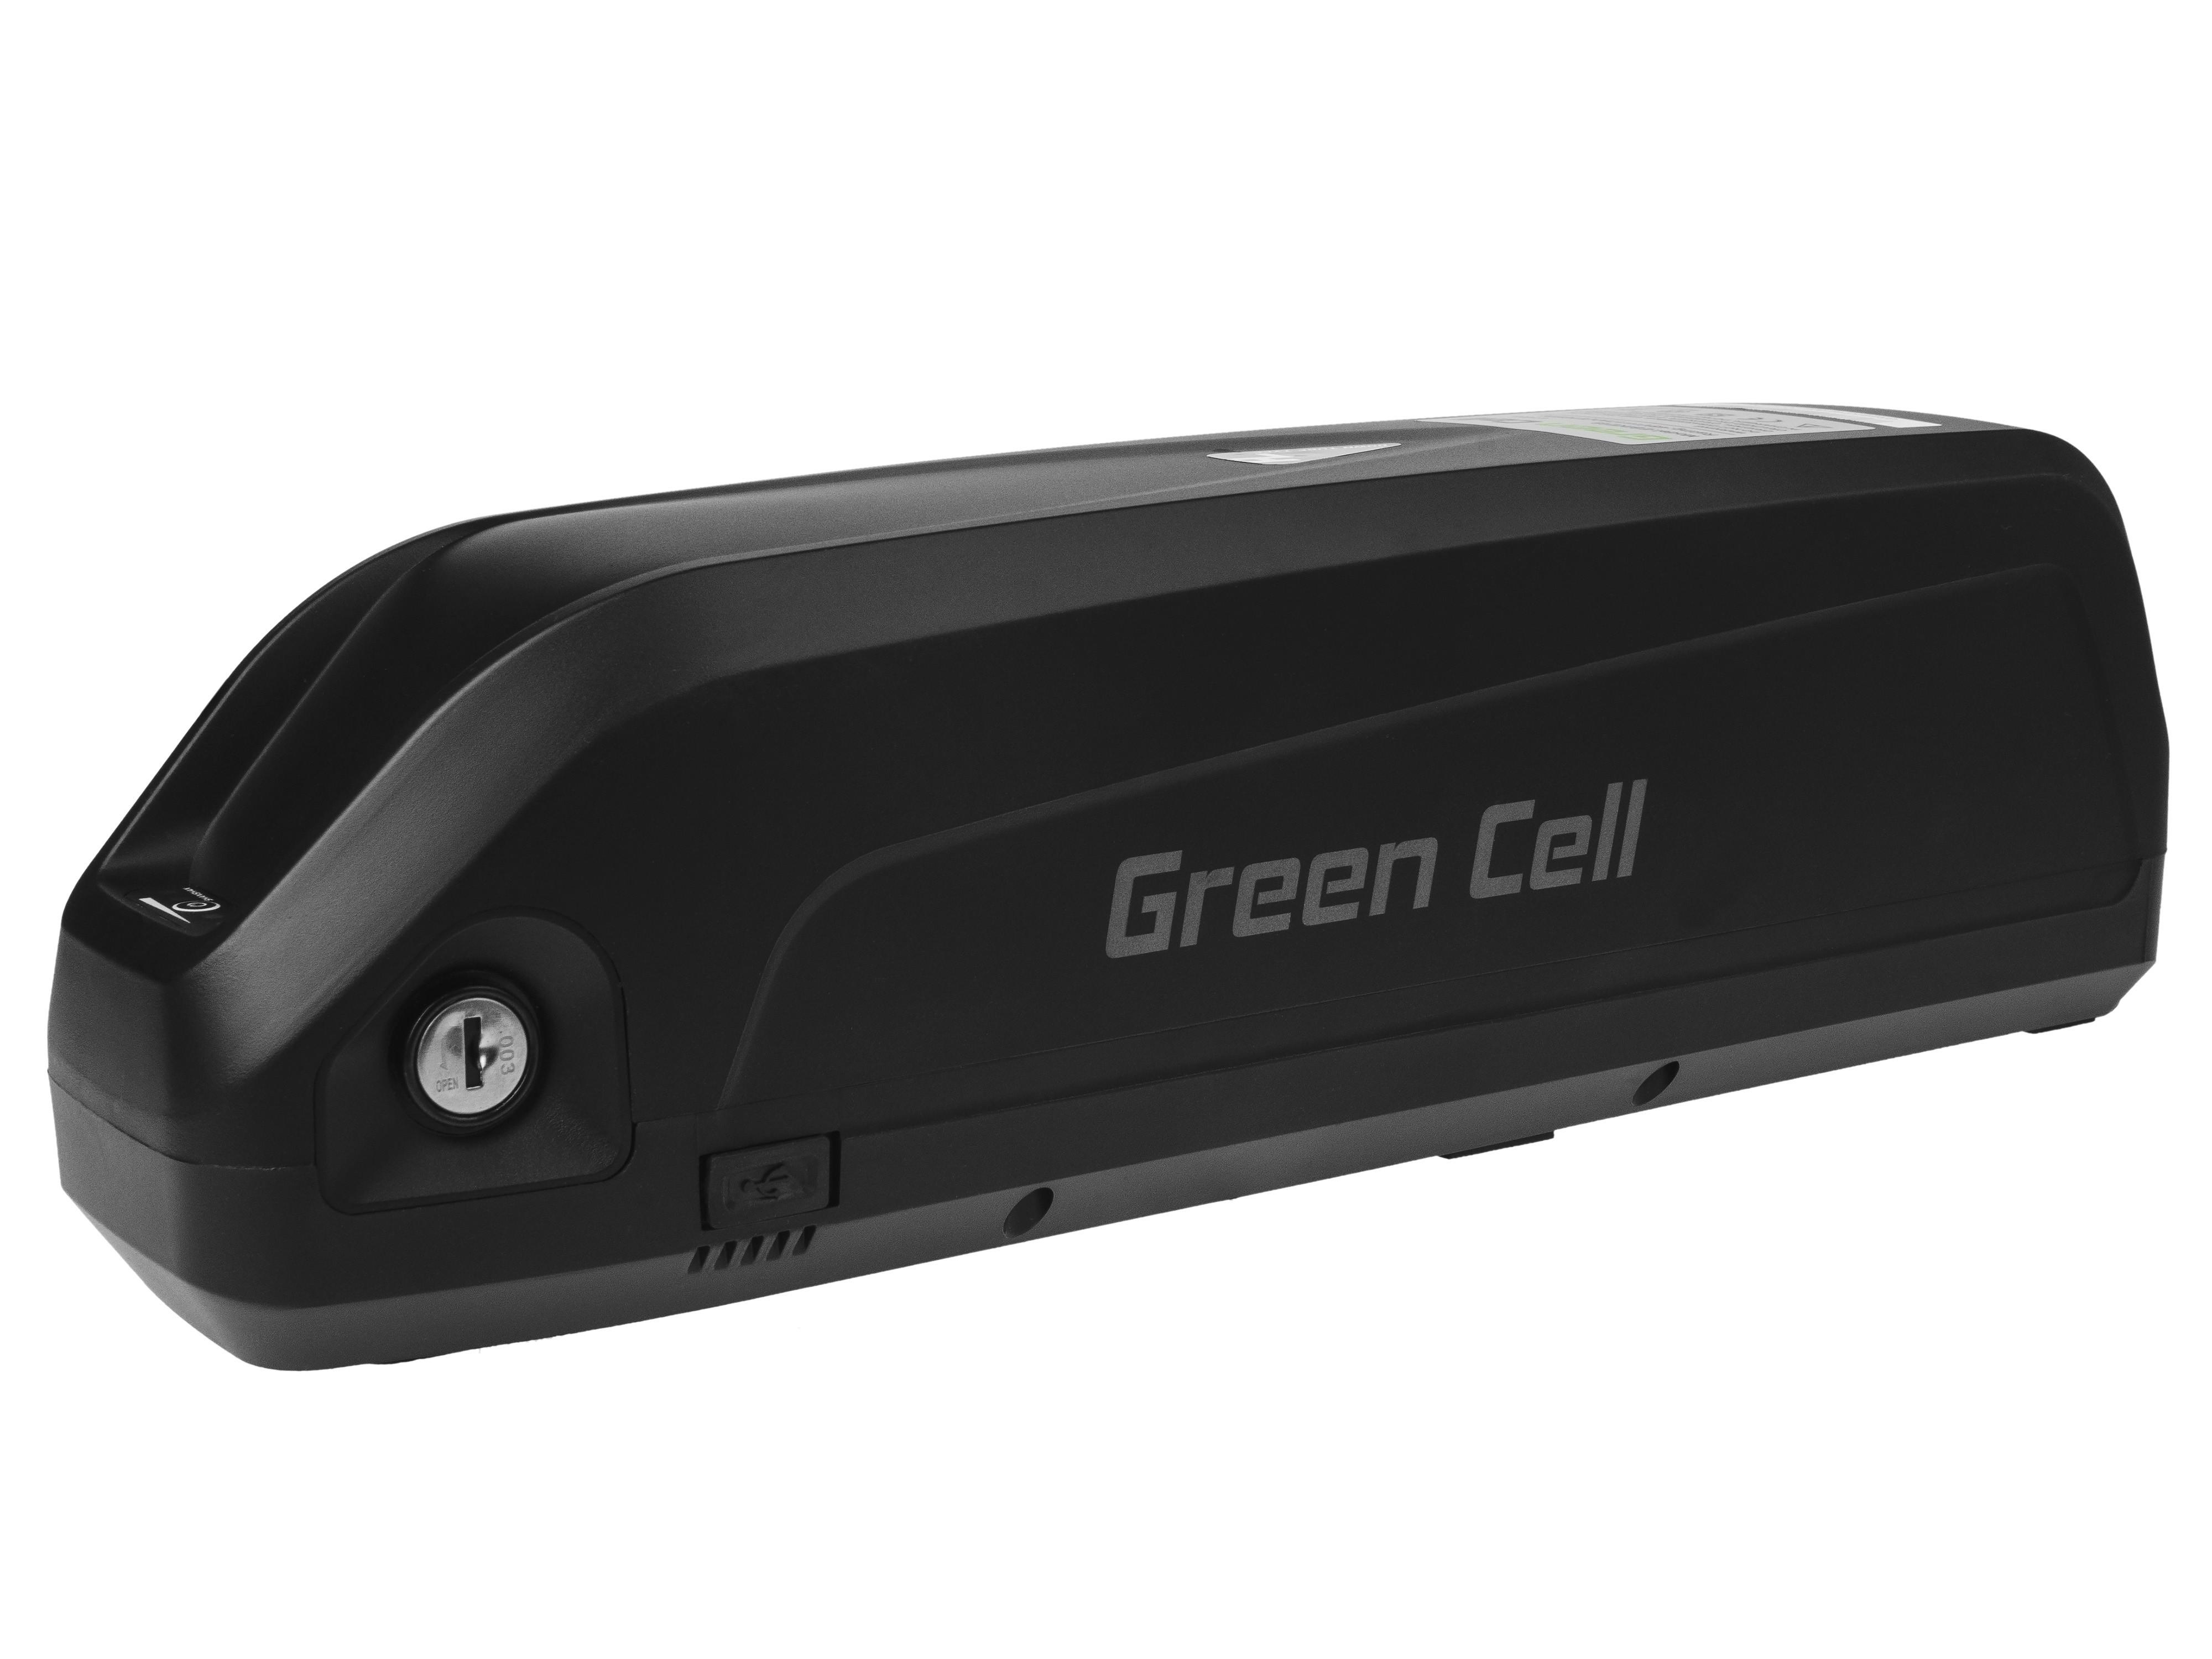 Green Cell eBike Battery Down Tube 48V 17Ah 816Wh E-Bike Pedelec Elektriskie skuteri un līdzsvara dēļi